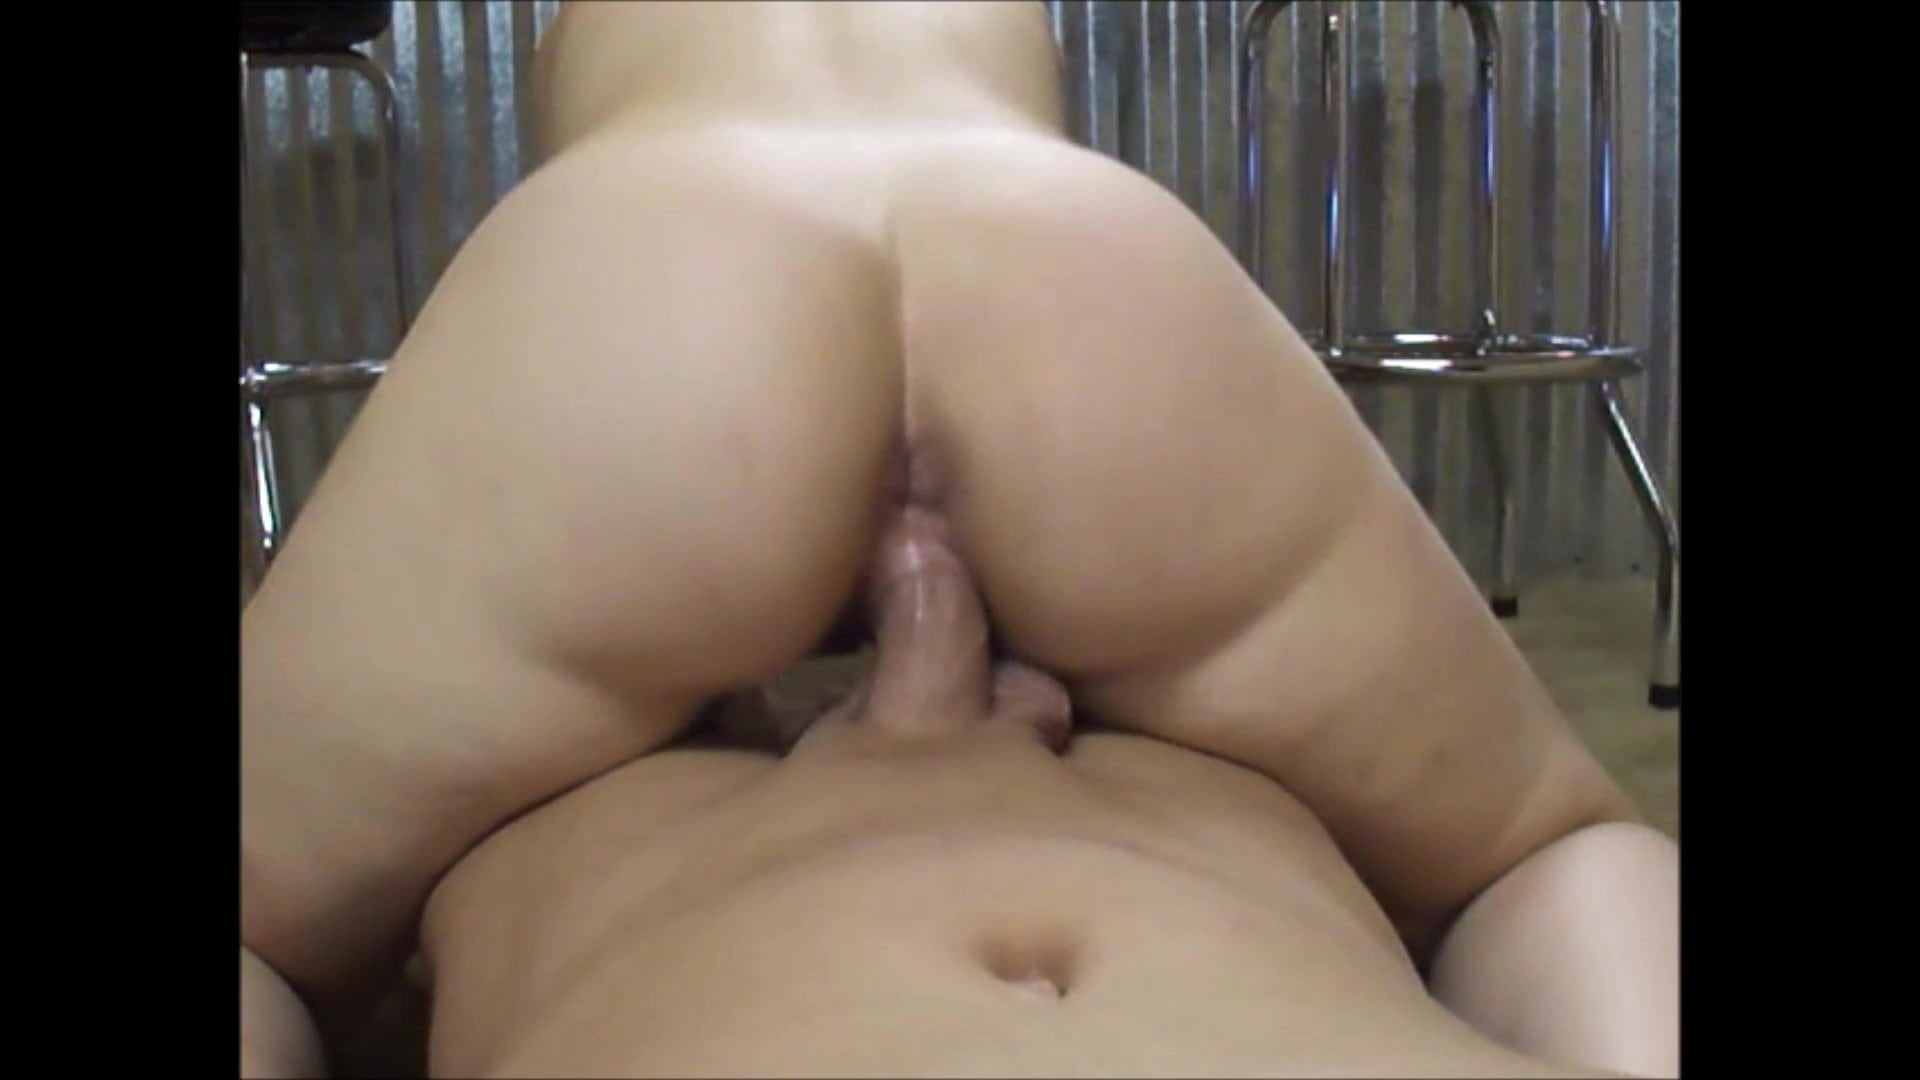 My Hot Milf Wife - Pov Creampie, Free Hd Porn Fe Xhamster-9407